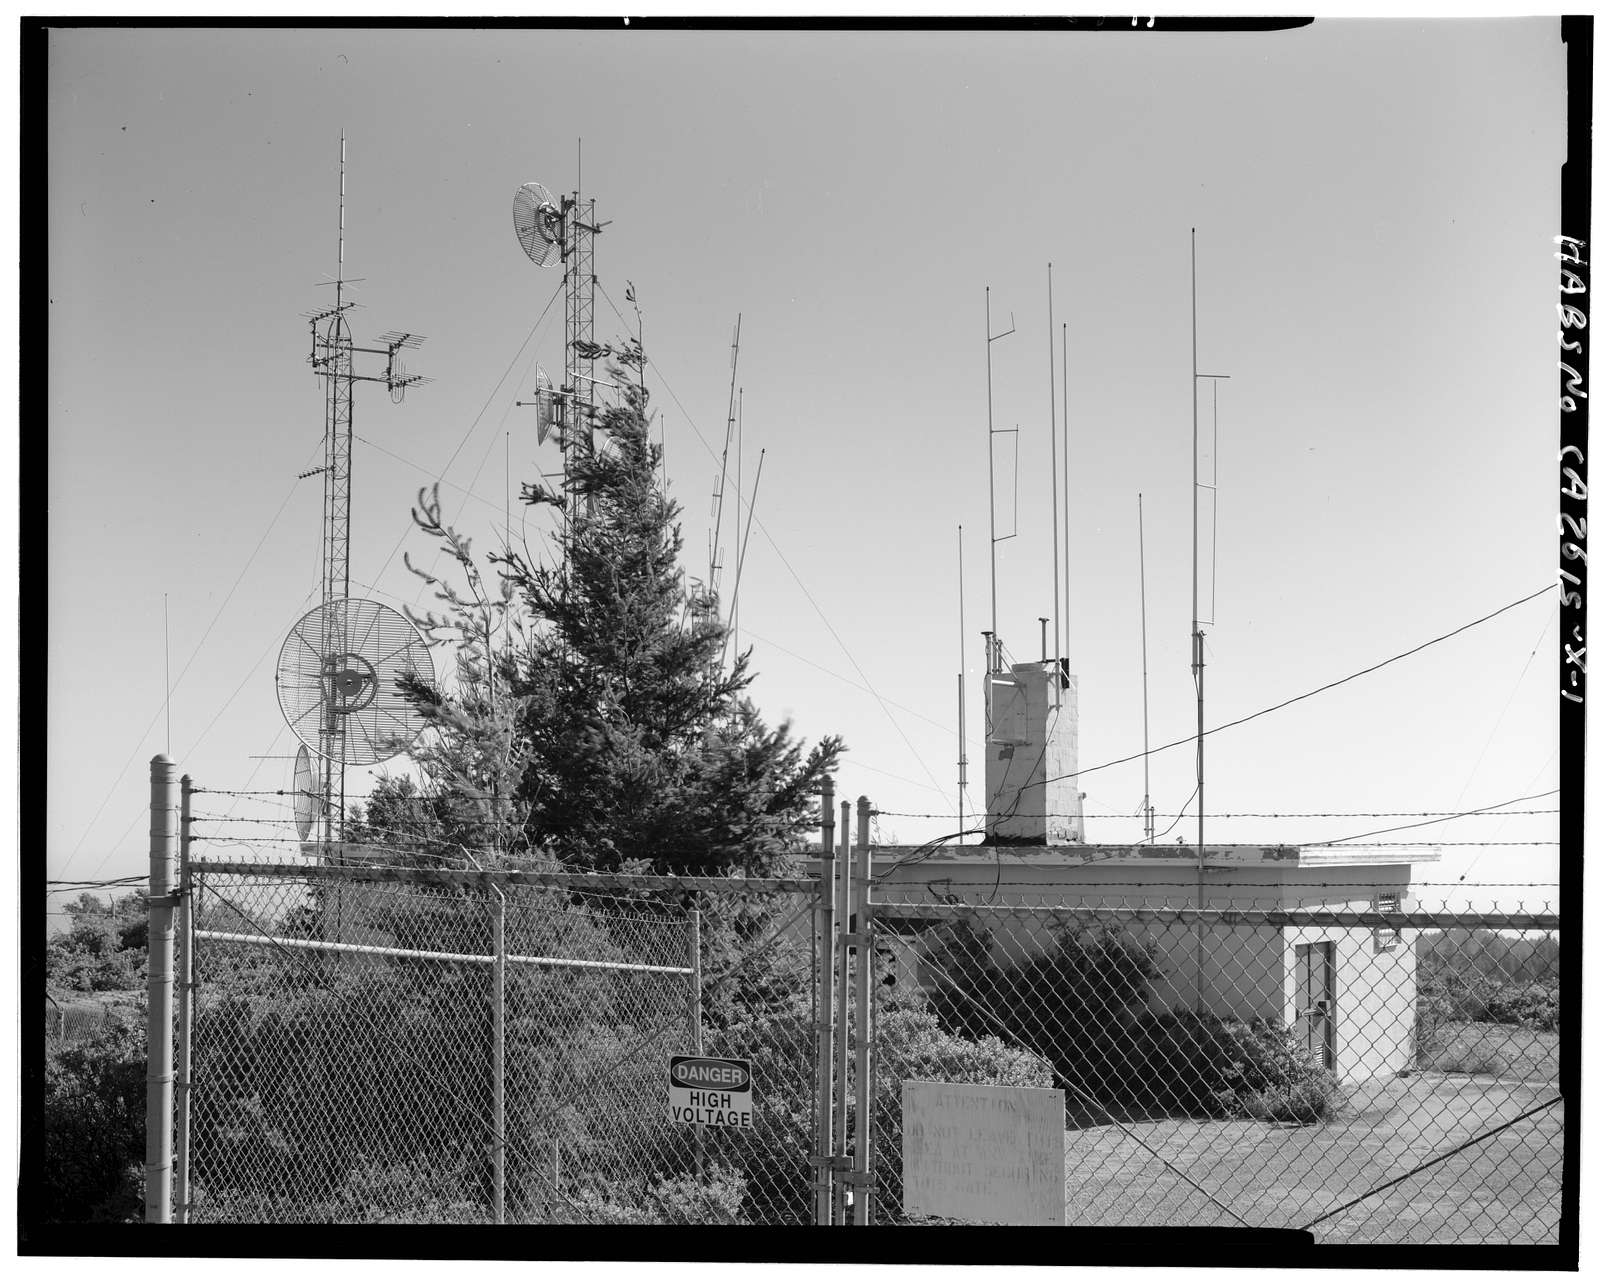 Mill Valley Air Force Station, Civil Engineering Storage, East Ridgecrest Boulevard, Mount Tamalpais, Mill Valley, Marin County, CA